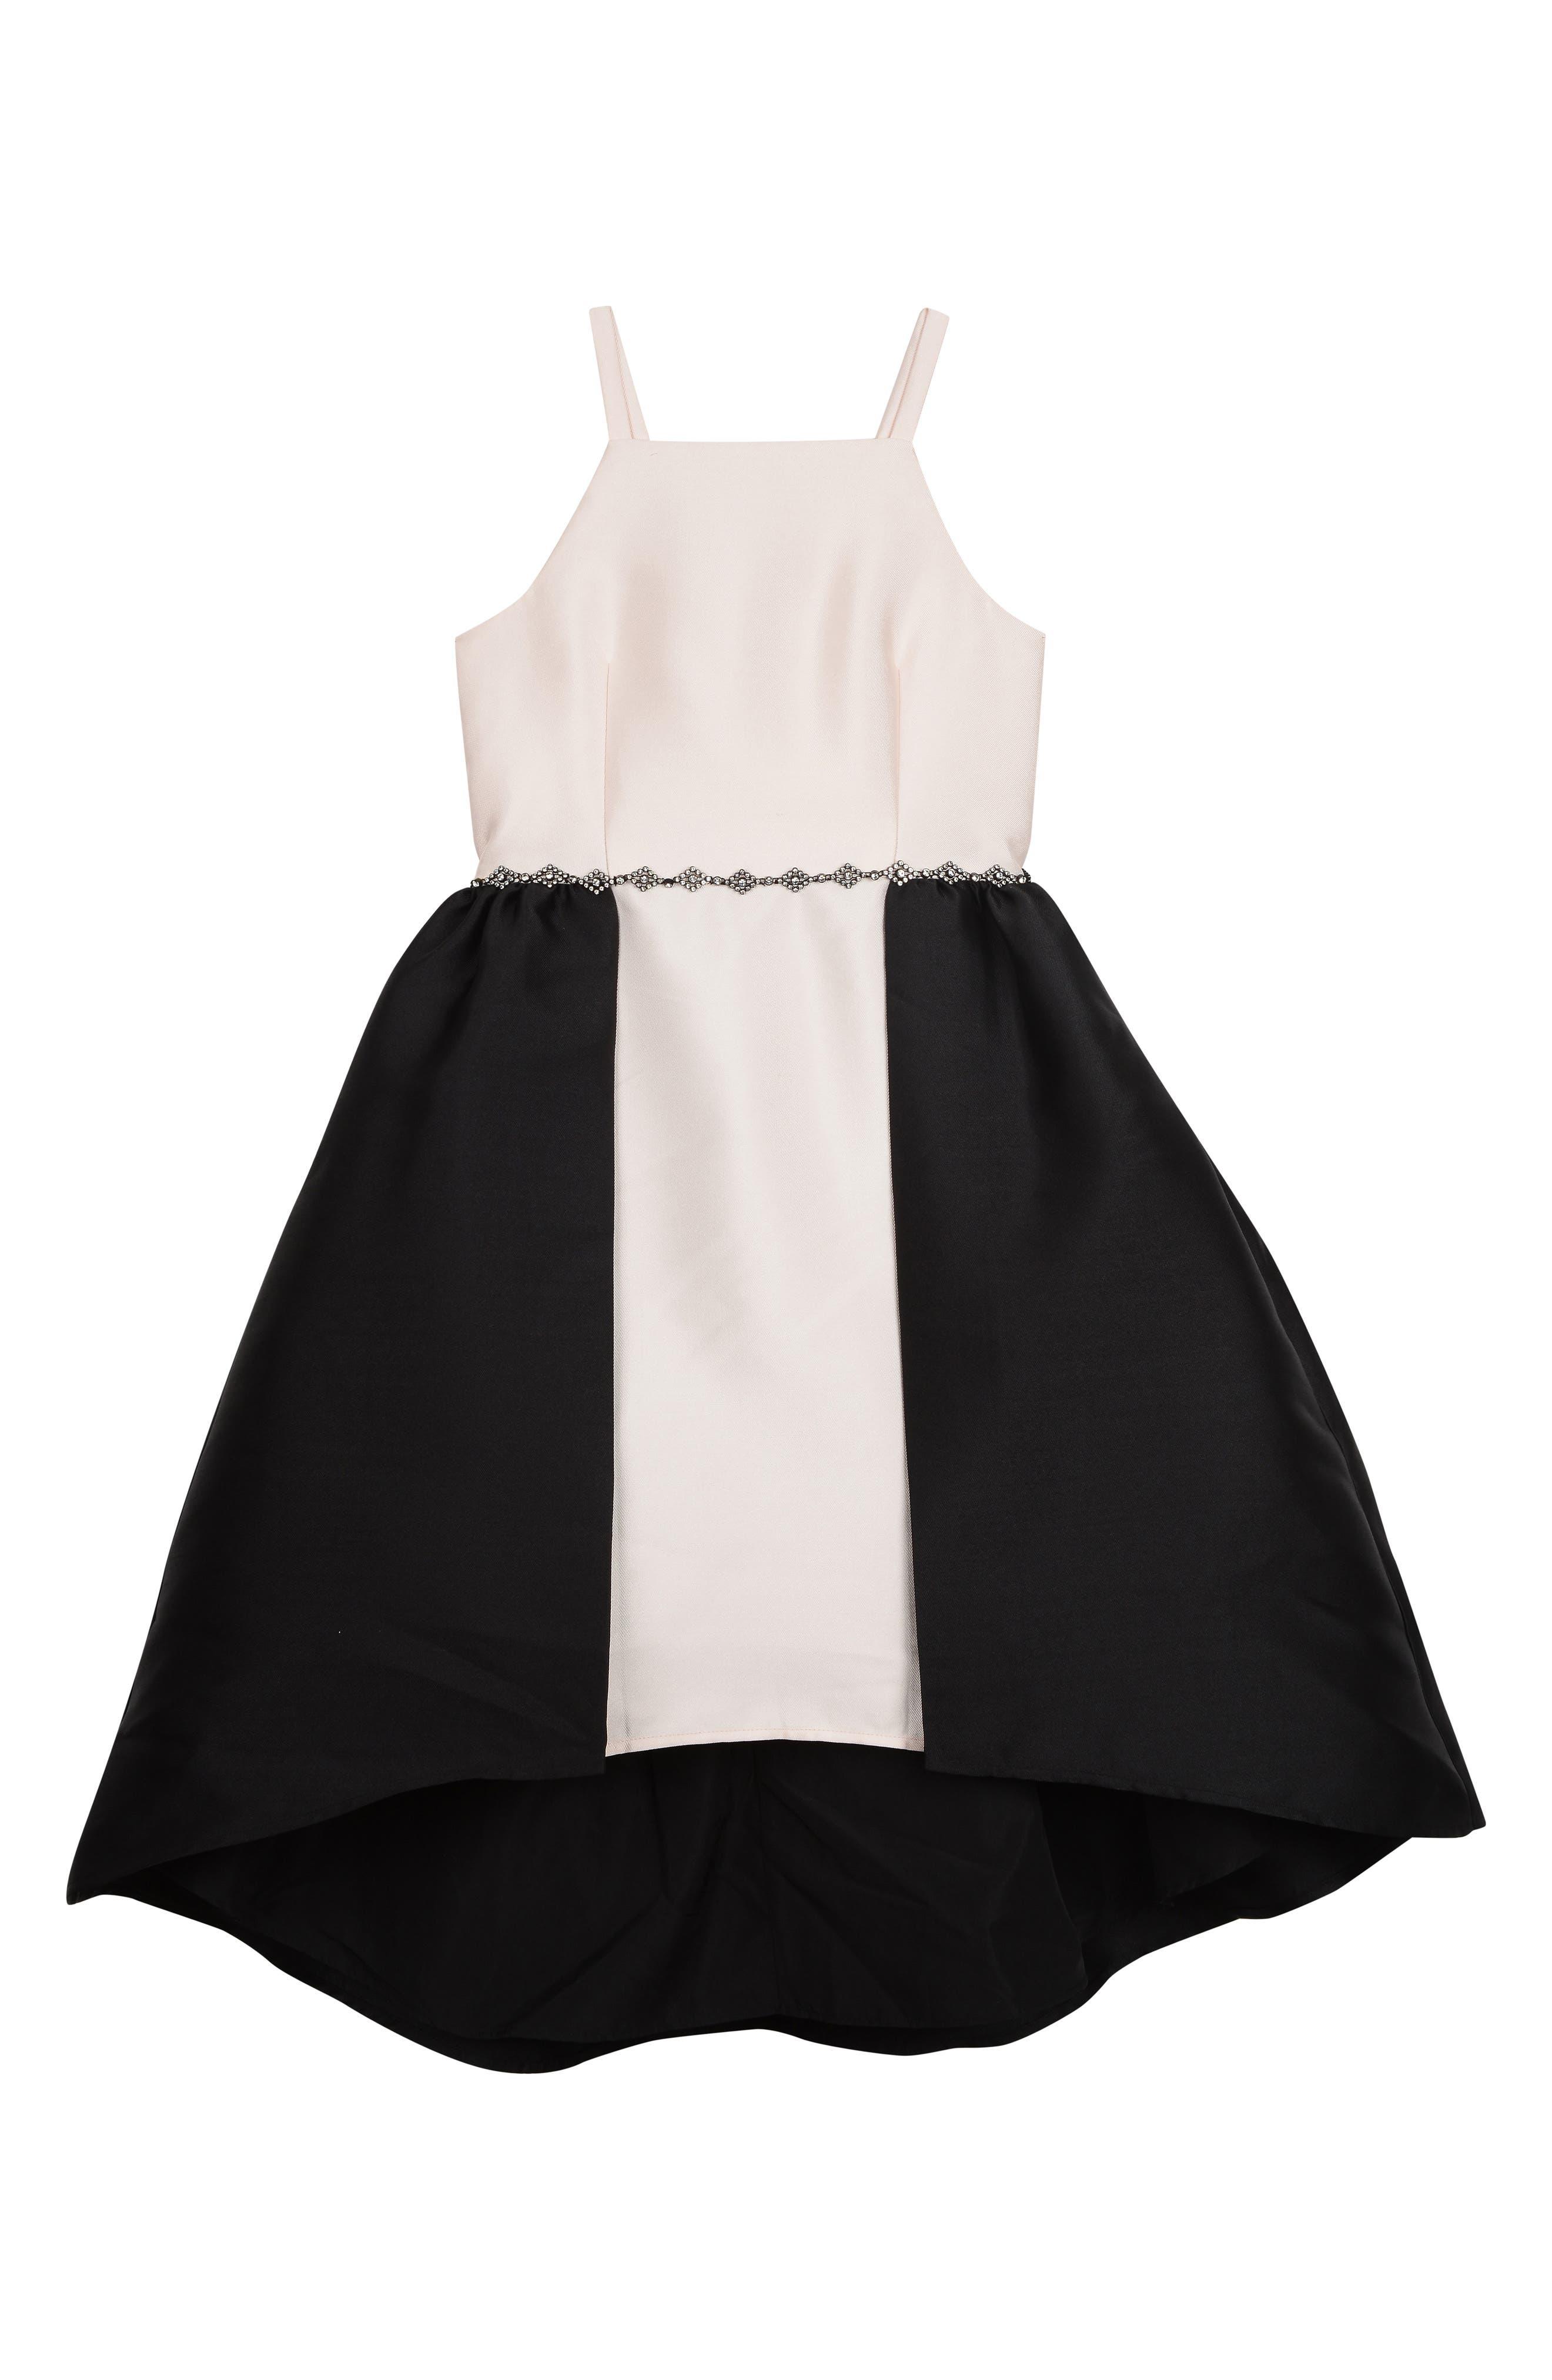 BADGLEY MISCHKA COLLECTION Badgley Mischka Colorblock Sleeveless Dress, Main, color, BLACK/ IVORY